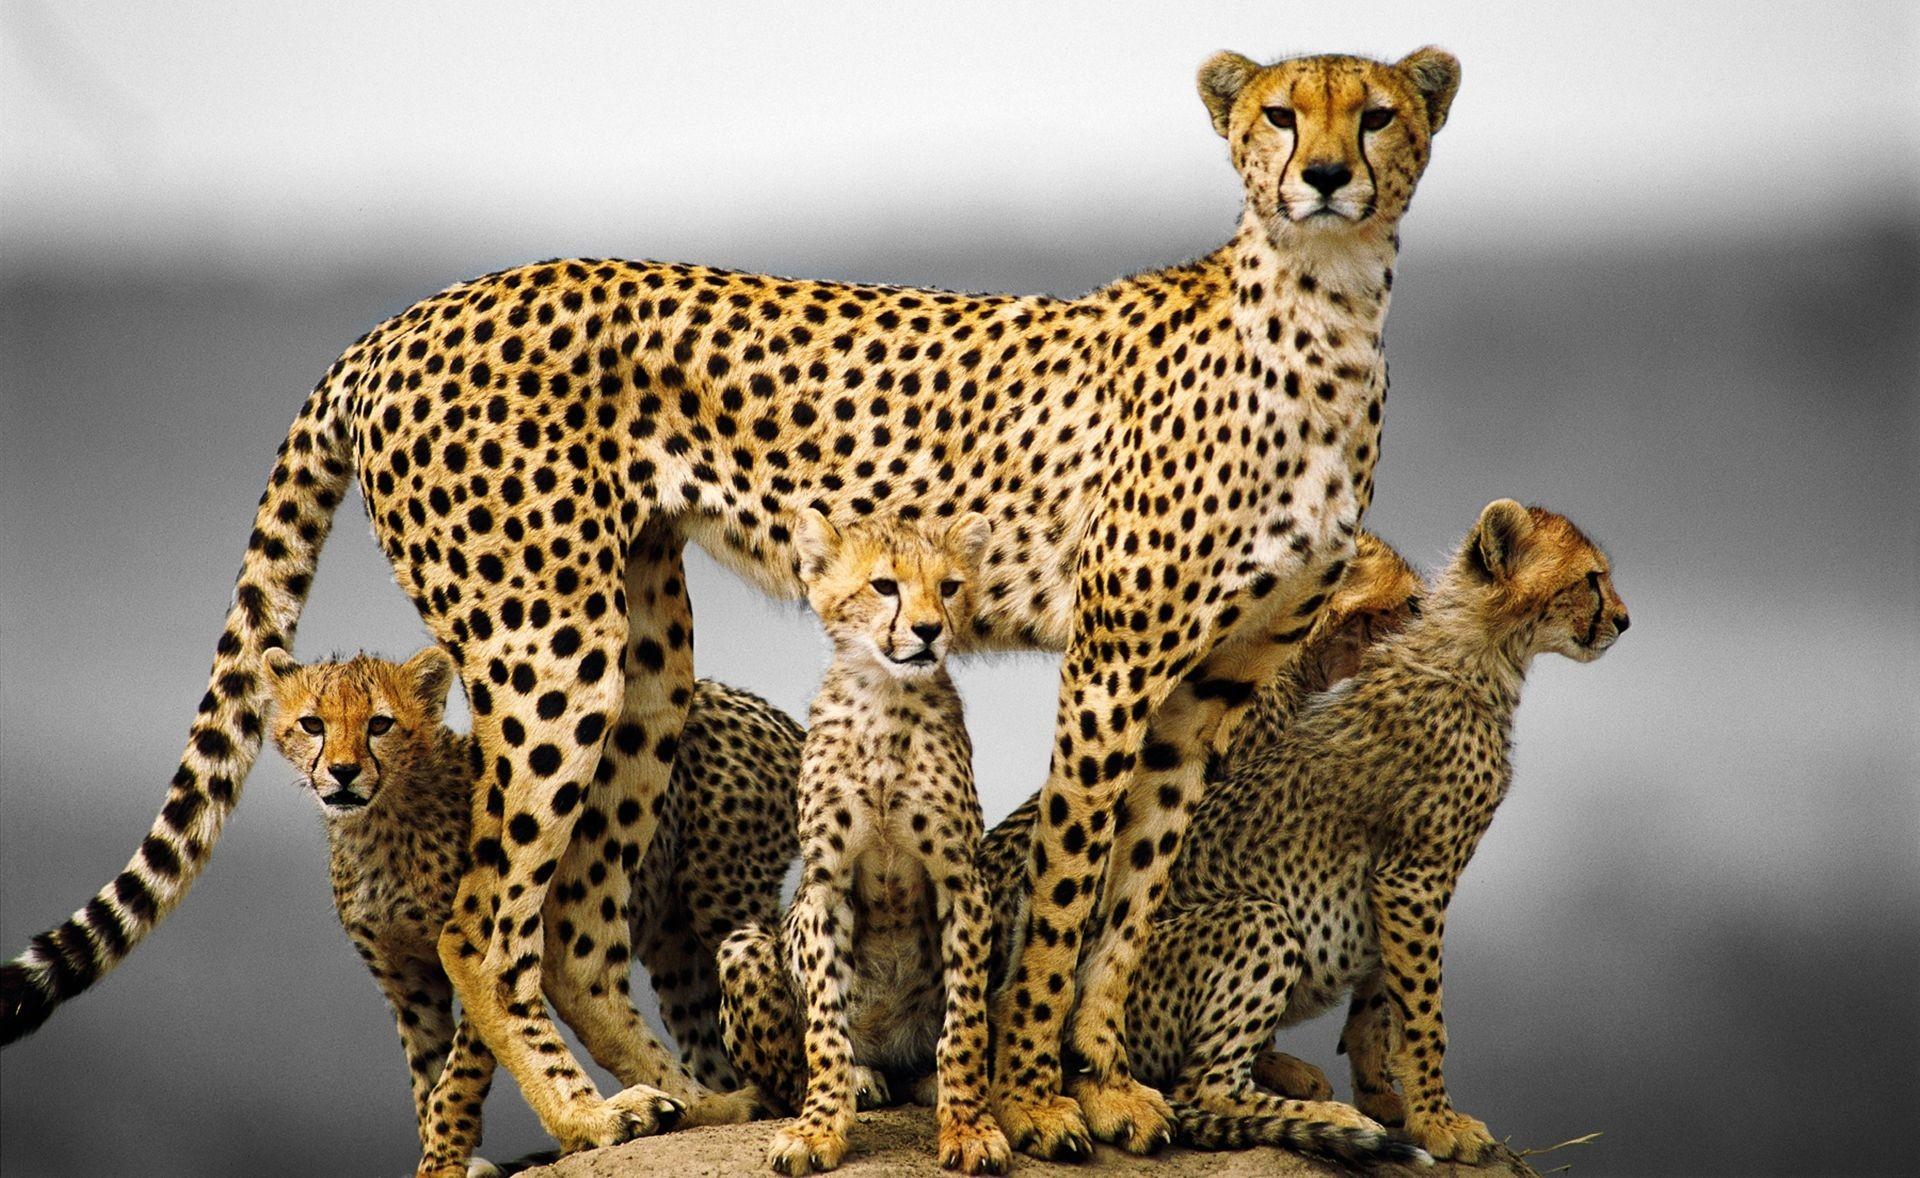 Res: 1920x1178, Cheetah Wallpapers 17 - 1920 X 1178